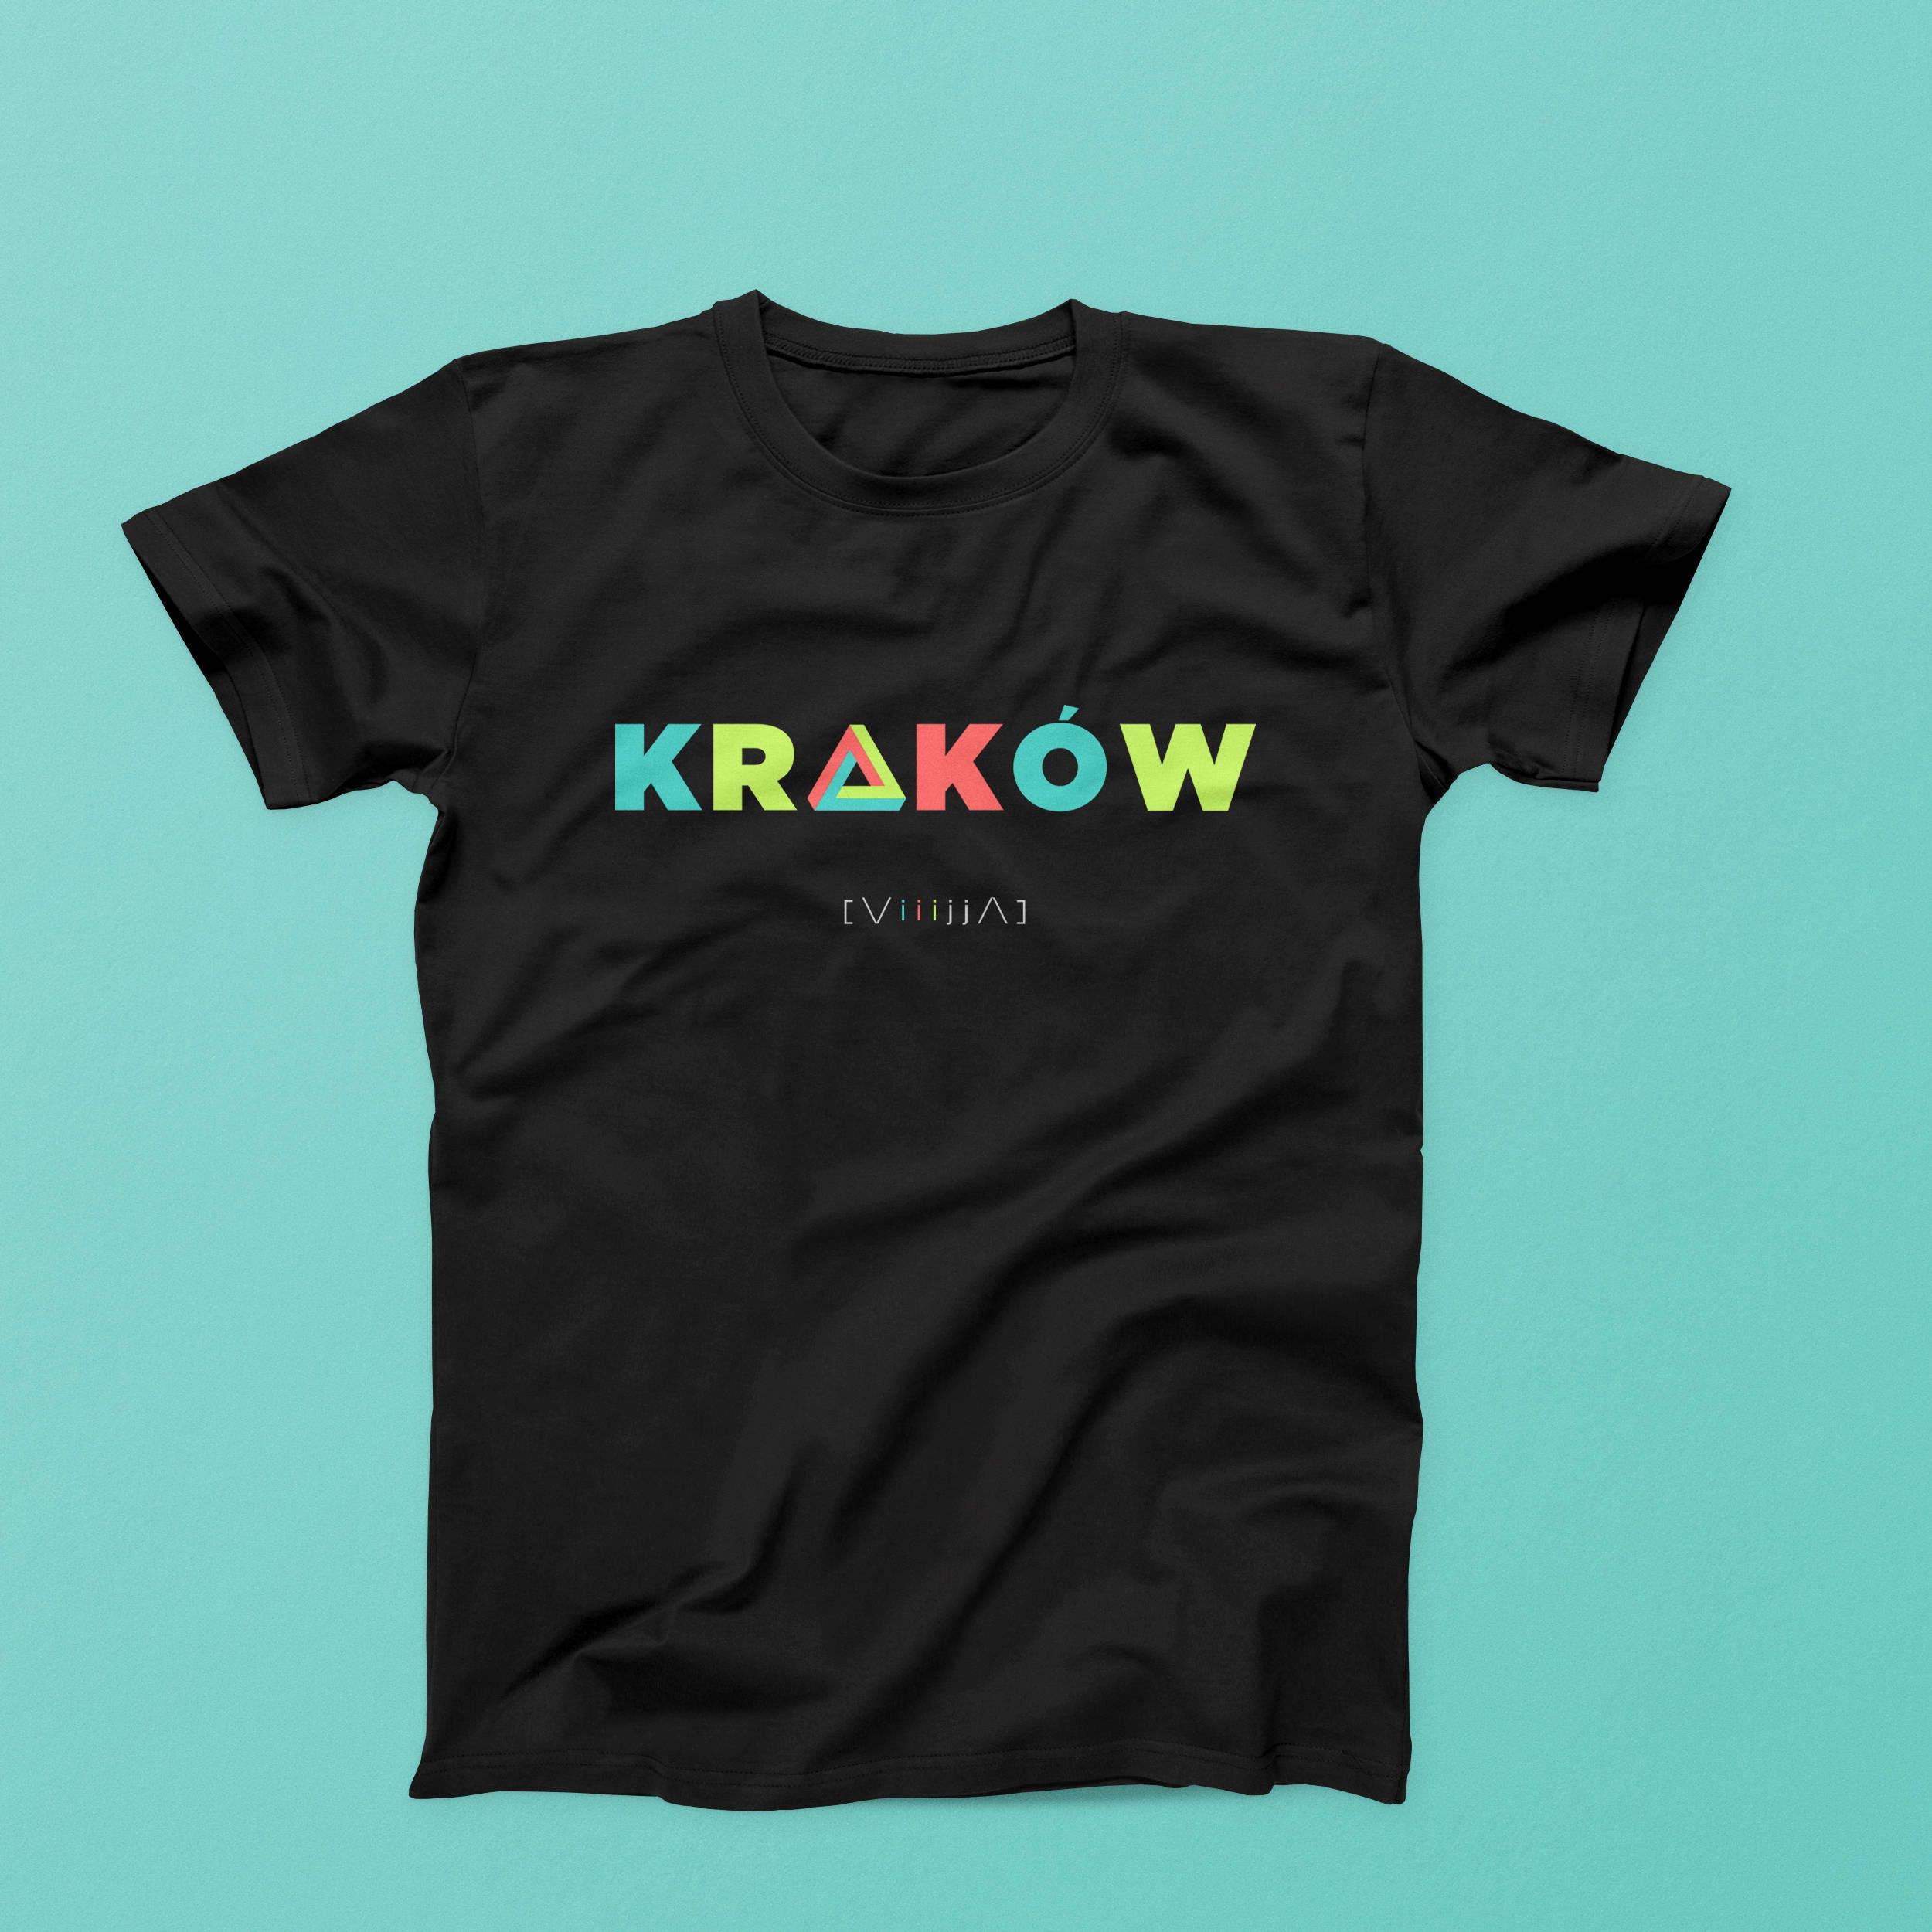 Camiseta Polonia Krakow Vintage Polaco Tshirt equipada Tee  0f6dee4aec2